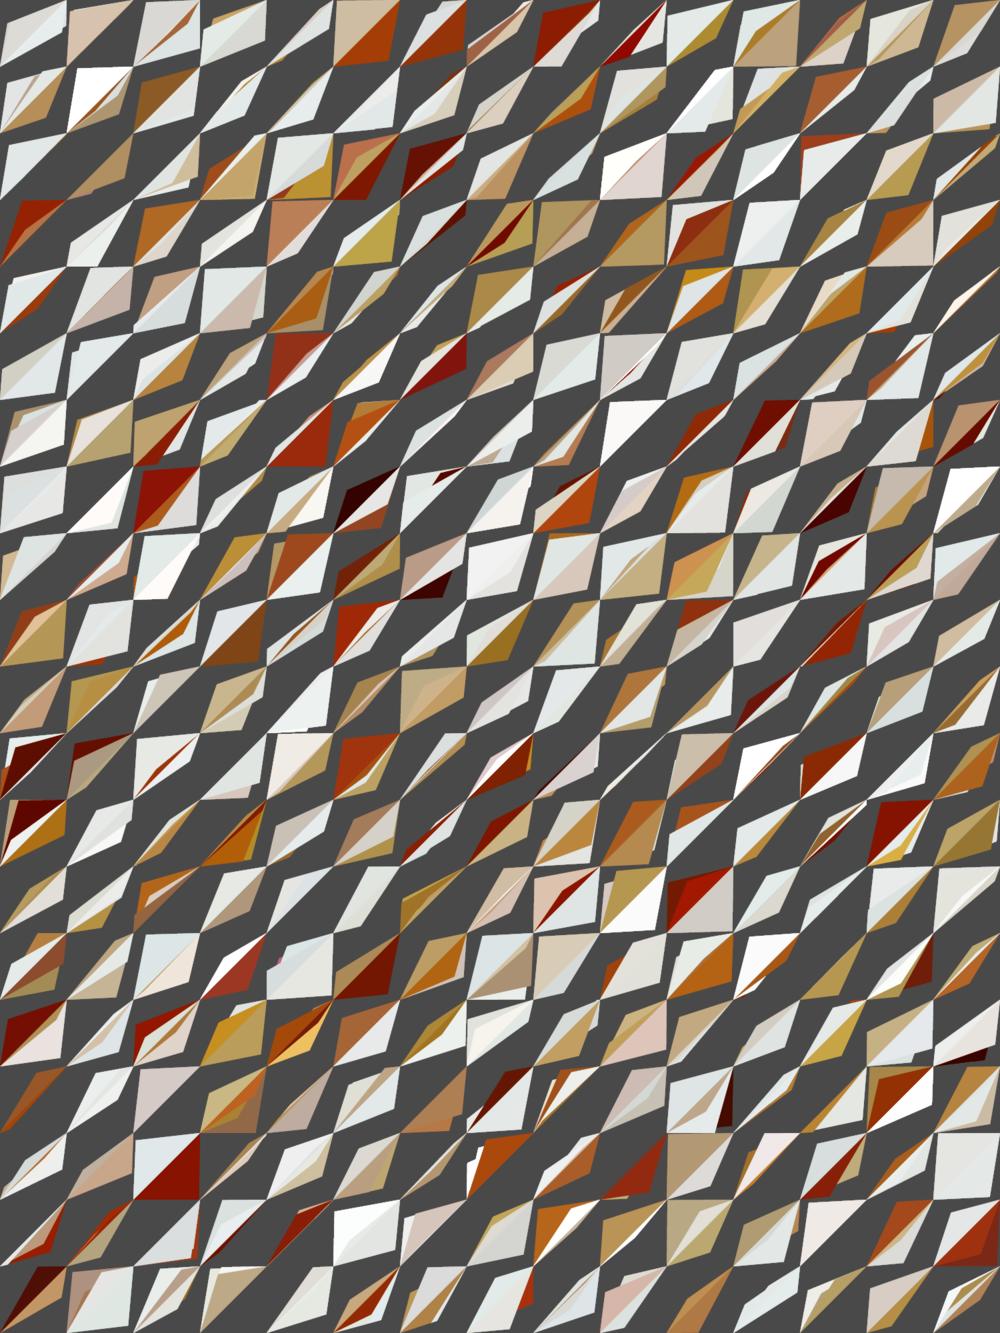 DiagonalPattern_CalDean.png